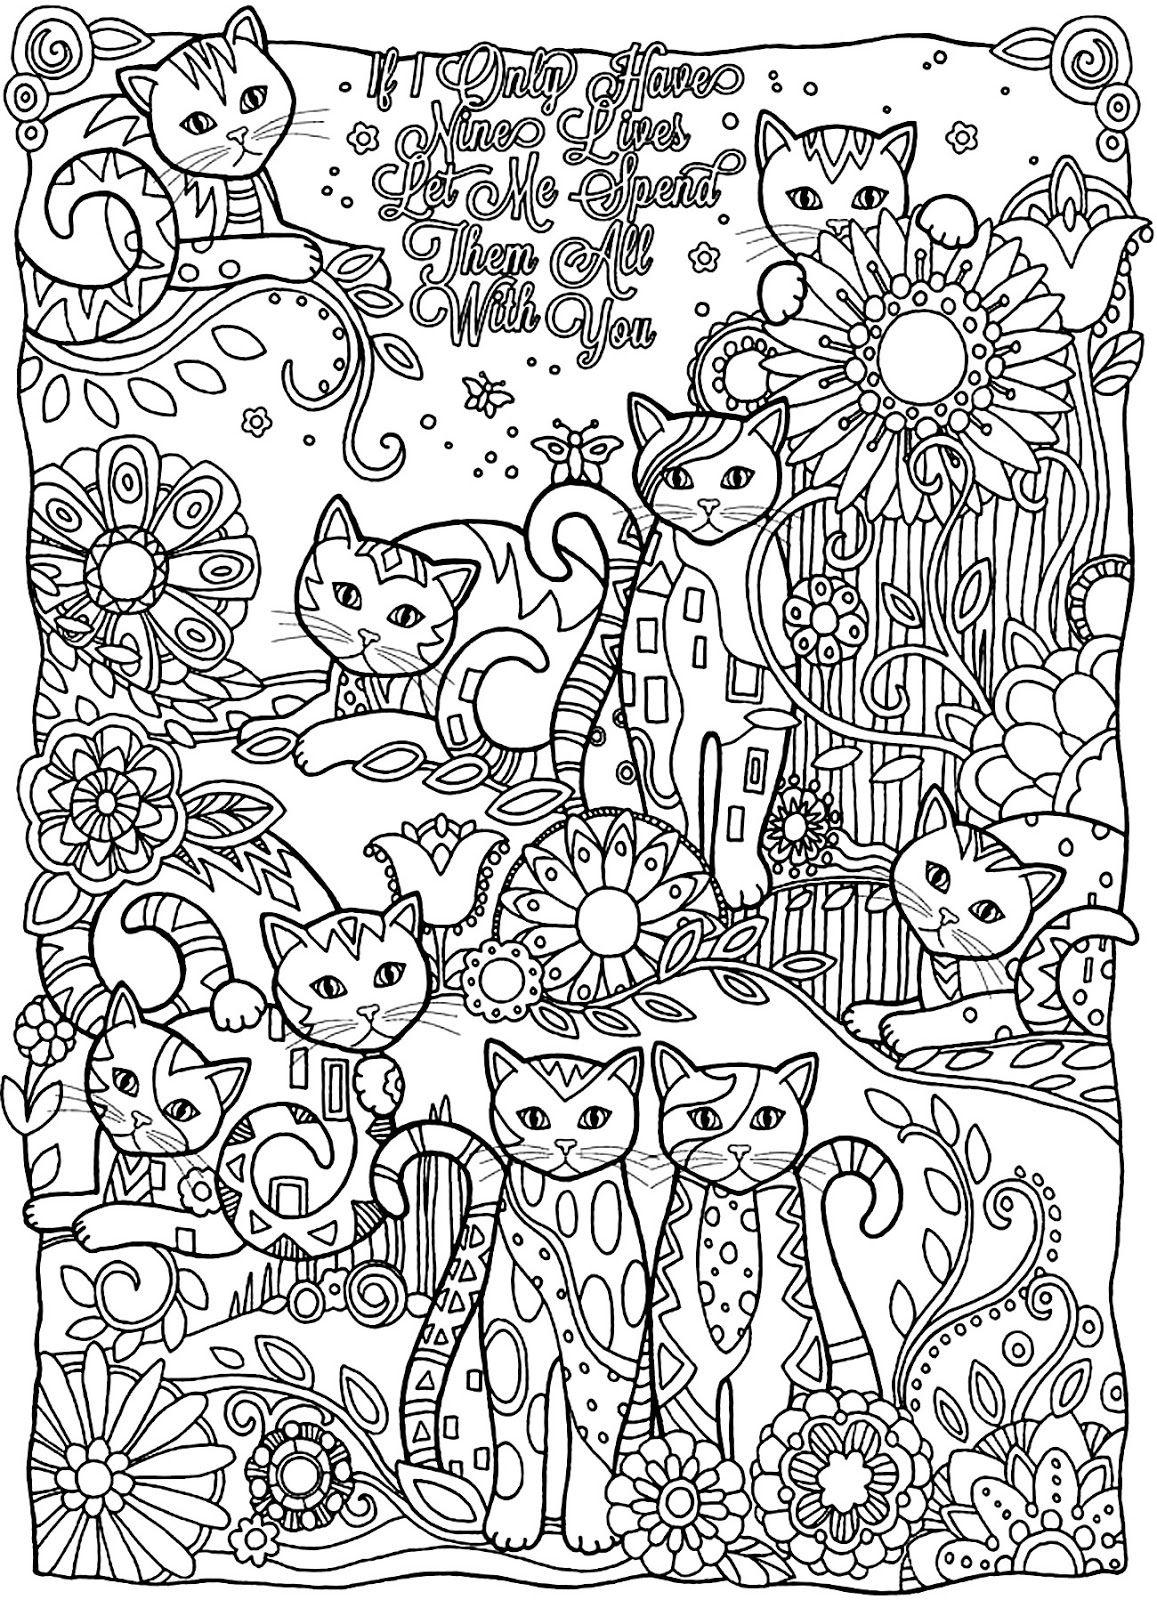 Pin de jennifer lee en Color My World | Pinterest | Colorear ...